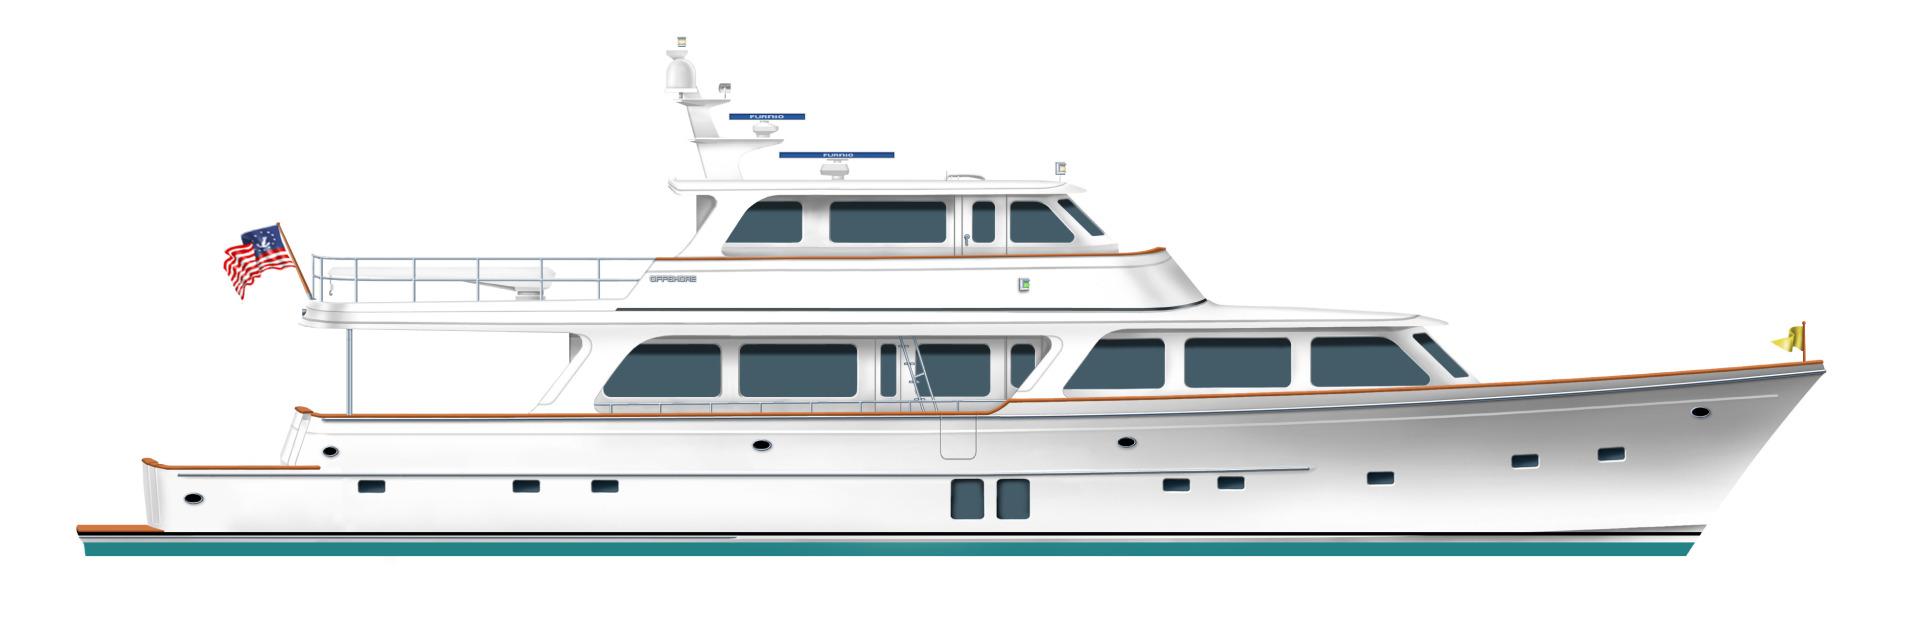 Offshore Yachts-Motoryacht 2020 -United States-1178678   Thumbnail